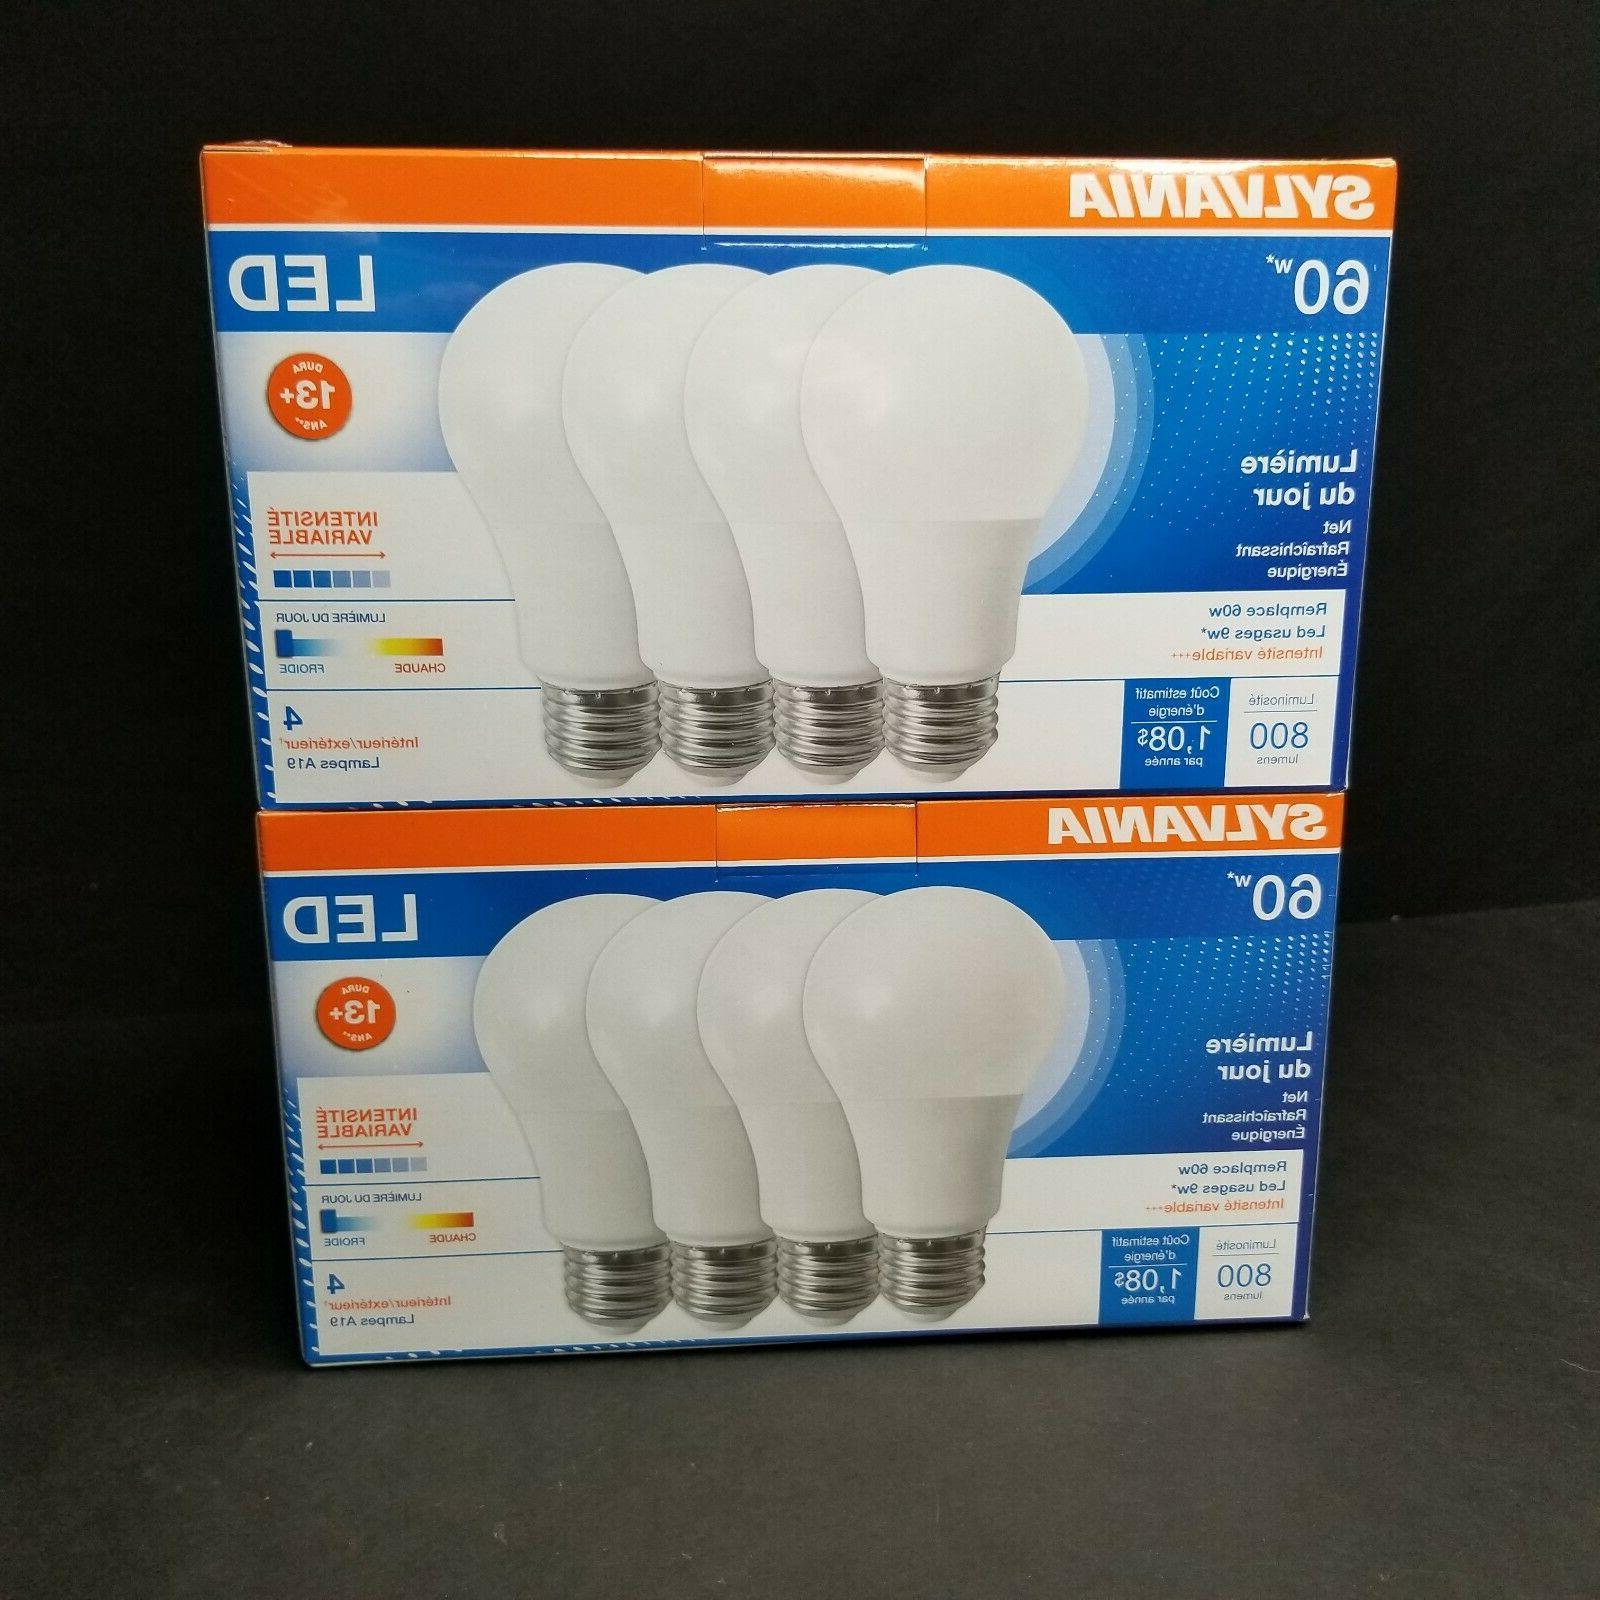 8 Sylvania 60w A19 Bulbs Daylight 800 Star New